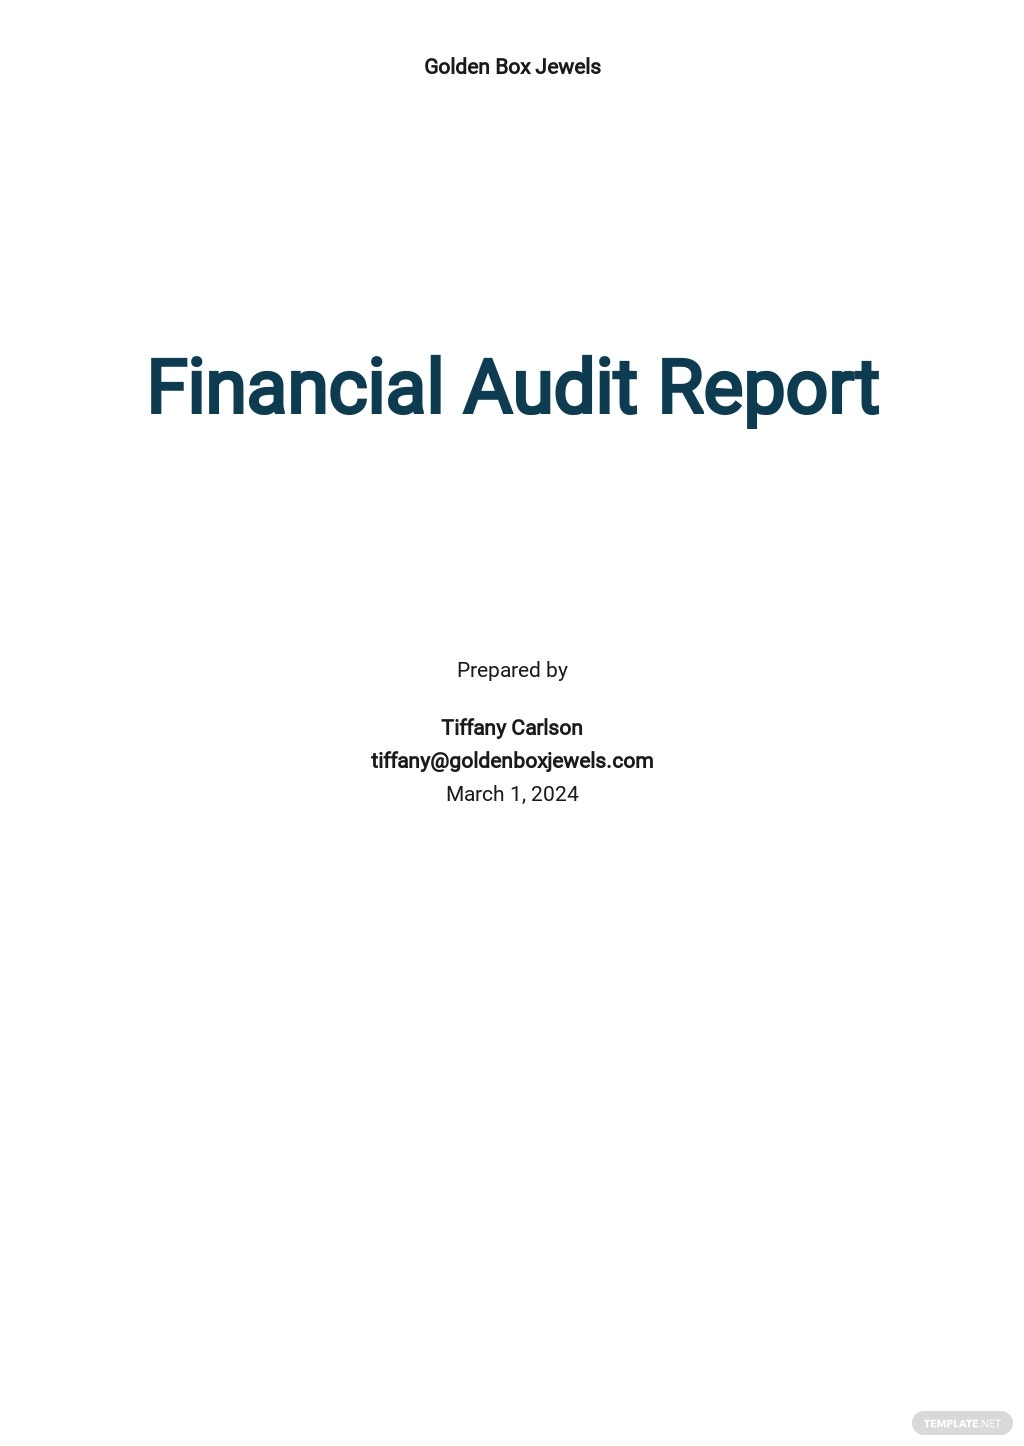 Financial Audit Report Template.jpe